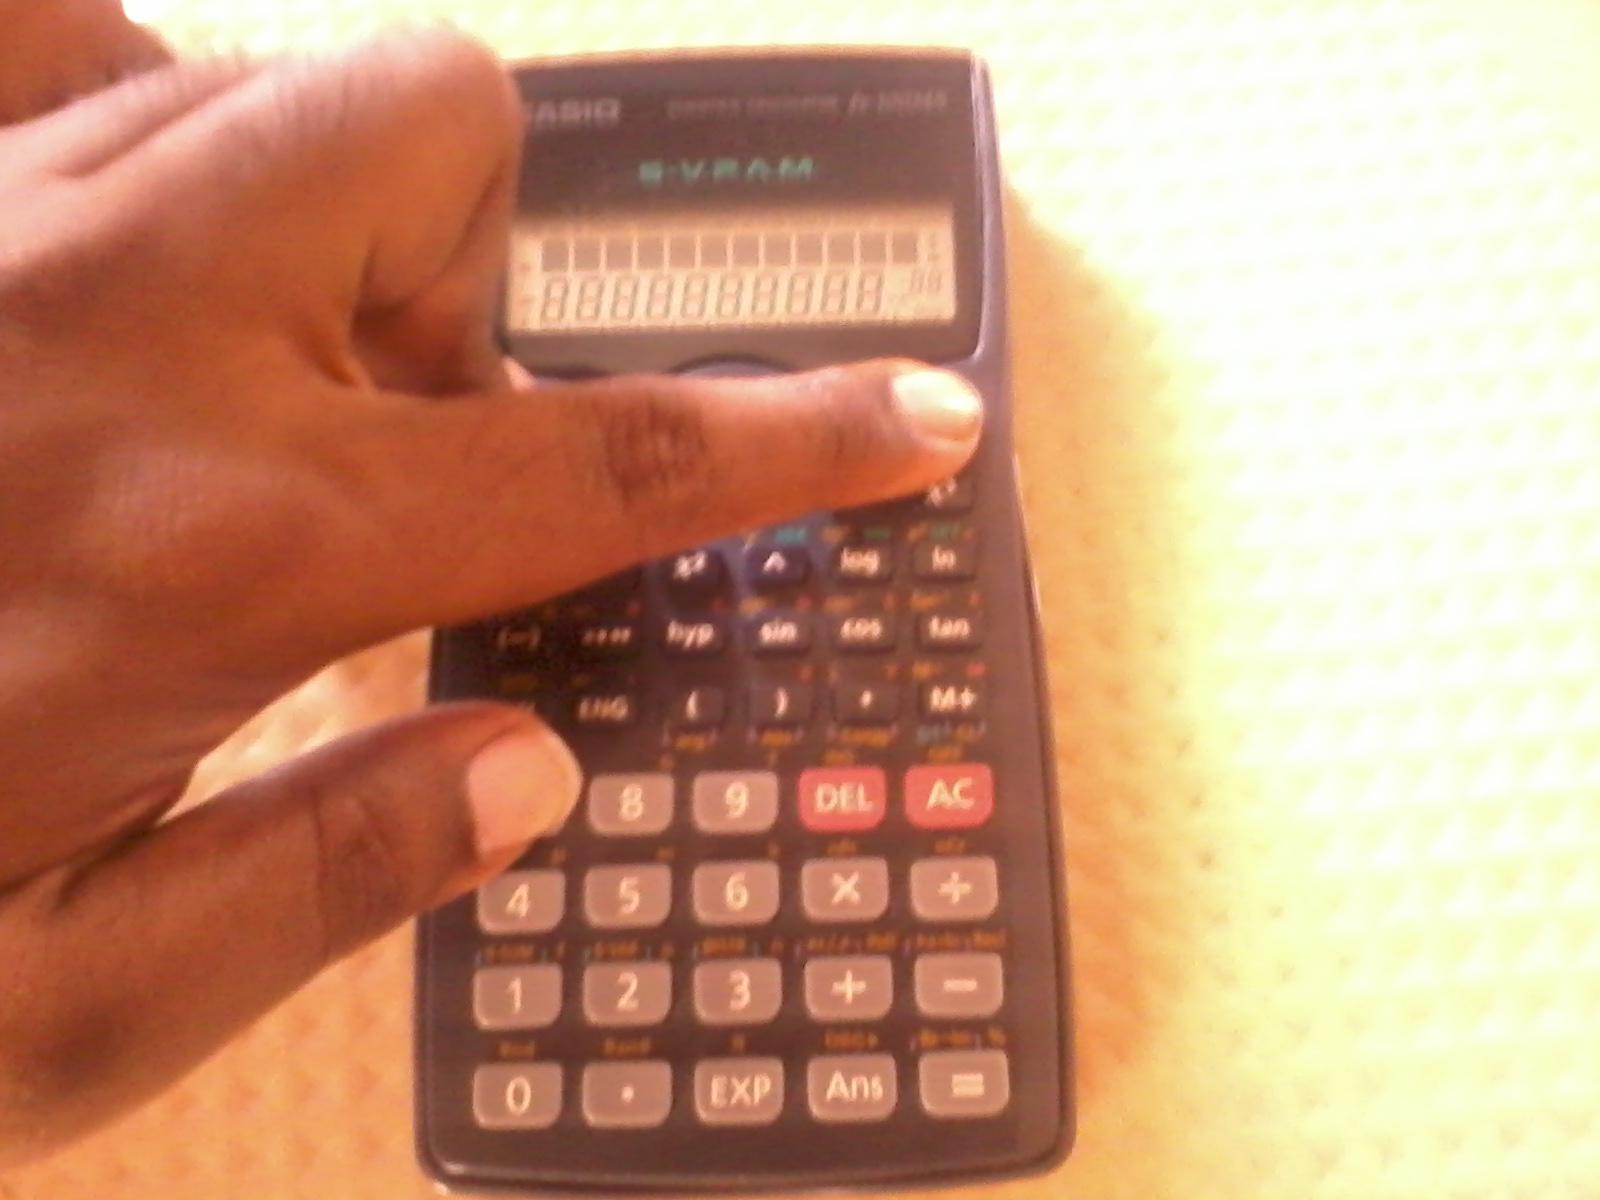 How To Find Scientific Calculator Is Original Or Duplicate